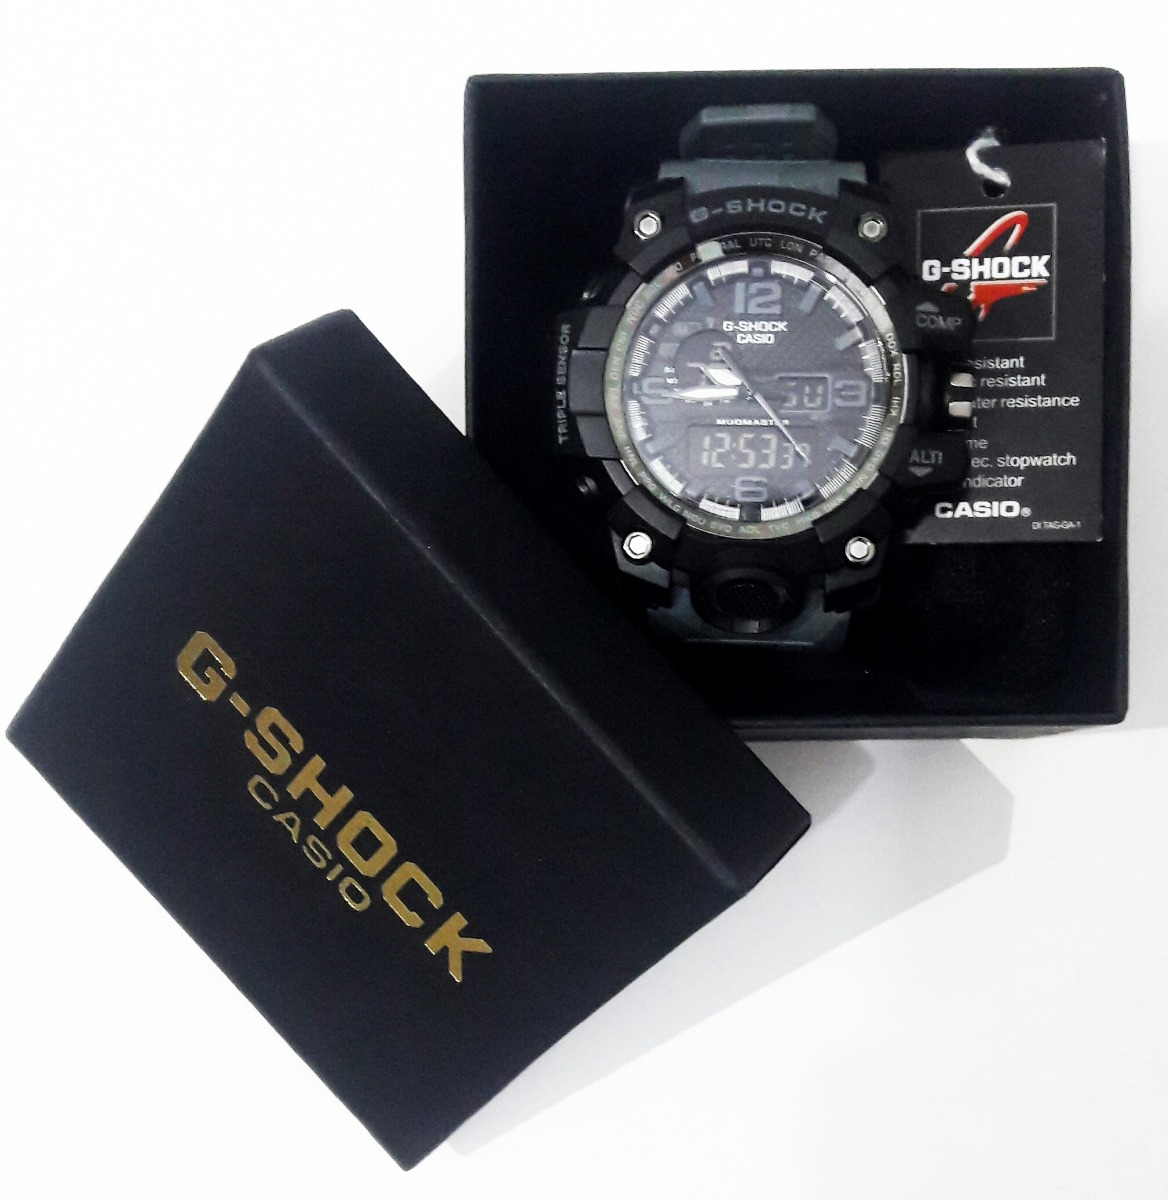 6f36d08b120 relógio masculino g-shock casio prova d água camuflado. Carregando zoom.